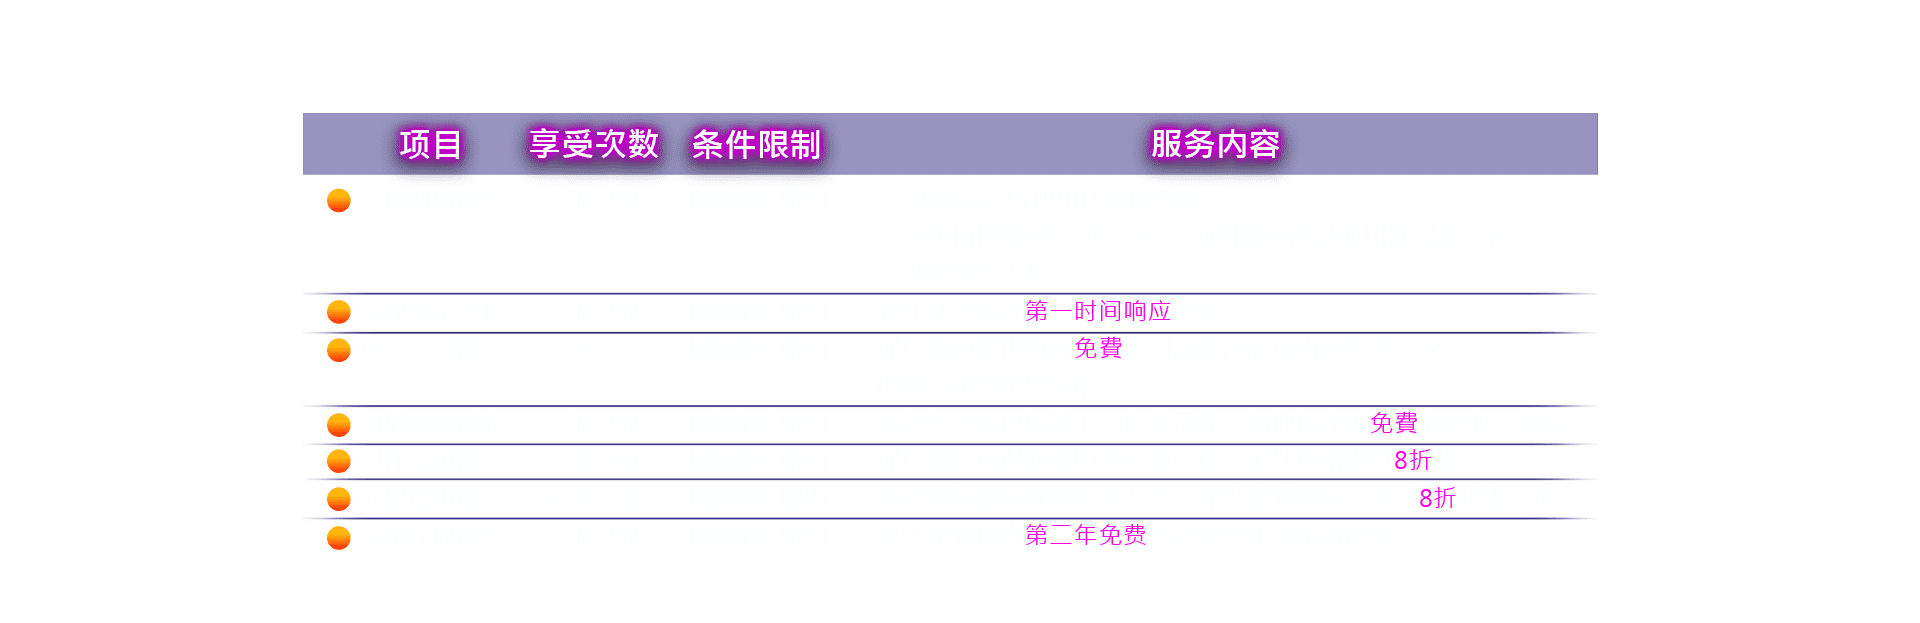 msi-2020微星大客戶7項服务专享优惠-服务内容